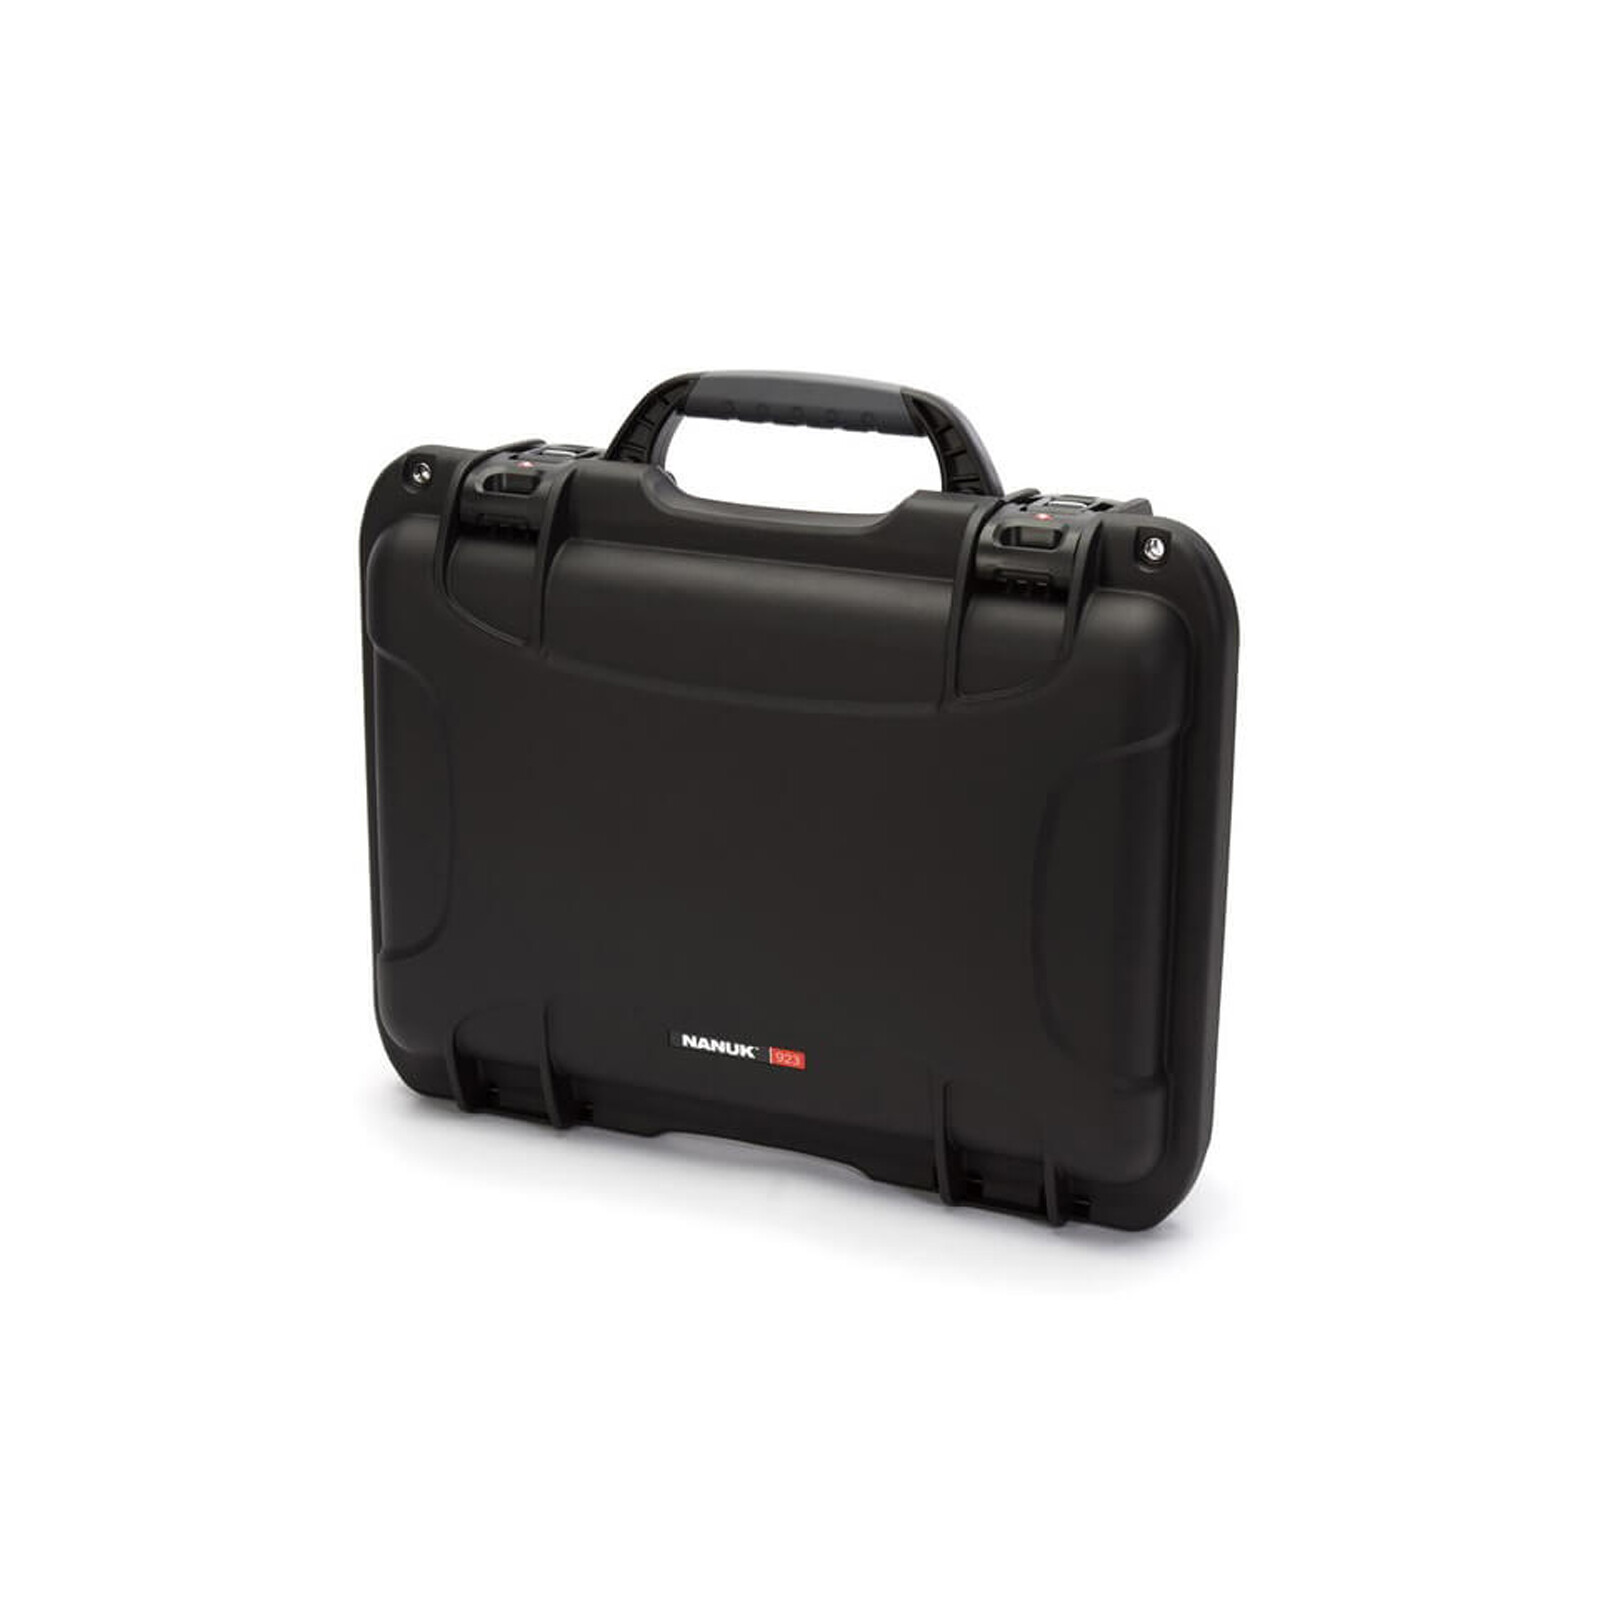 Nanuk Case 923 Black f. DJI Ronin-S